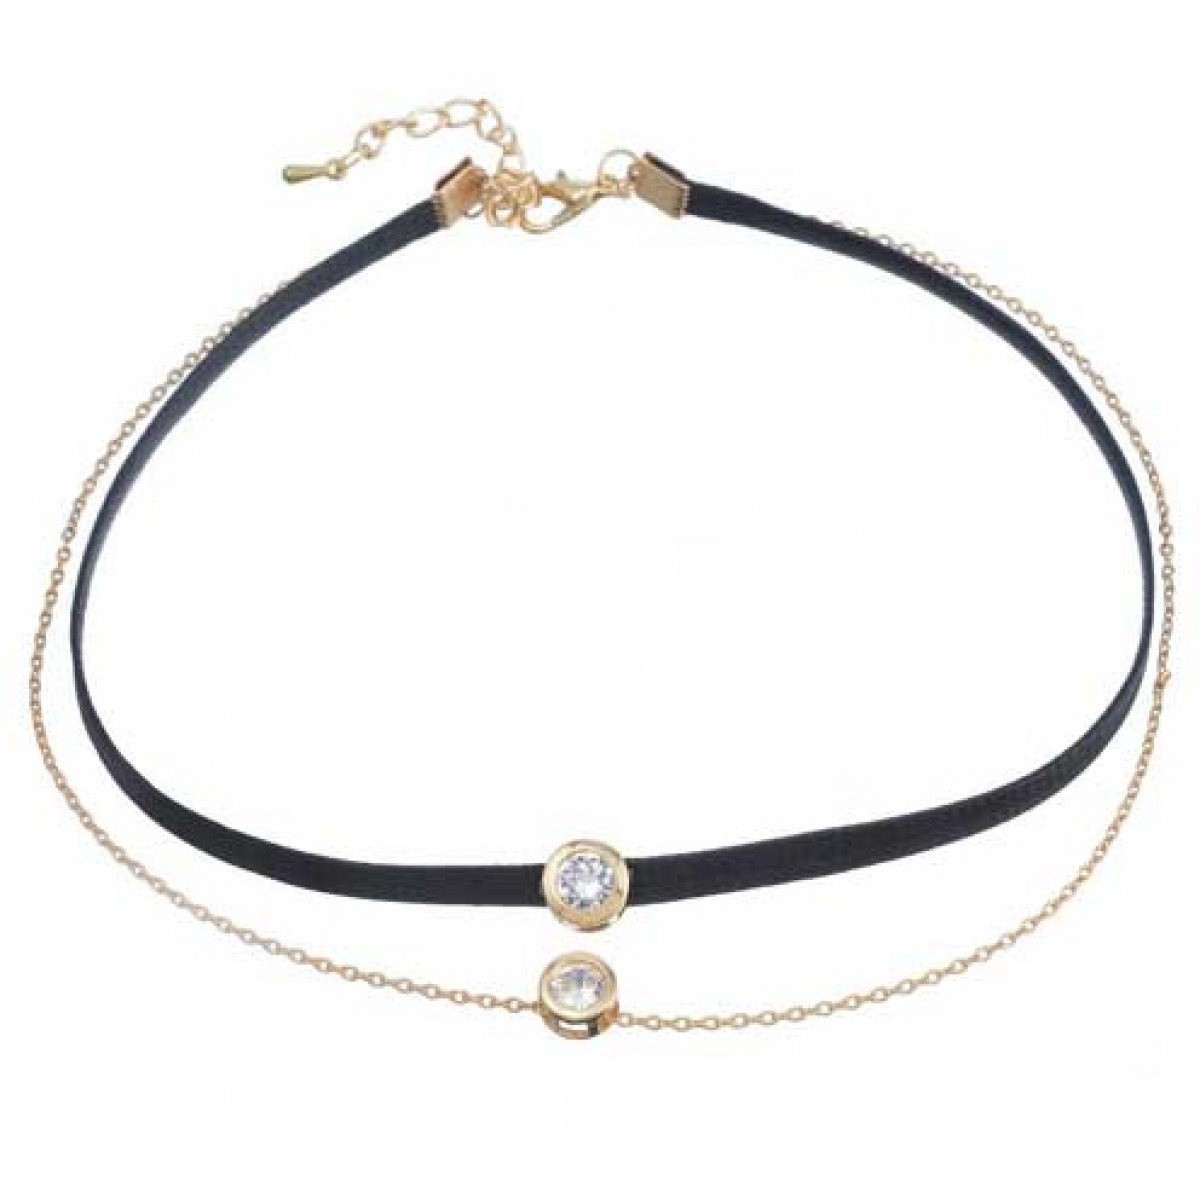 Black Diamond Choker Necklace for Women